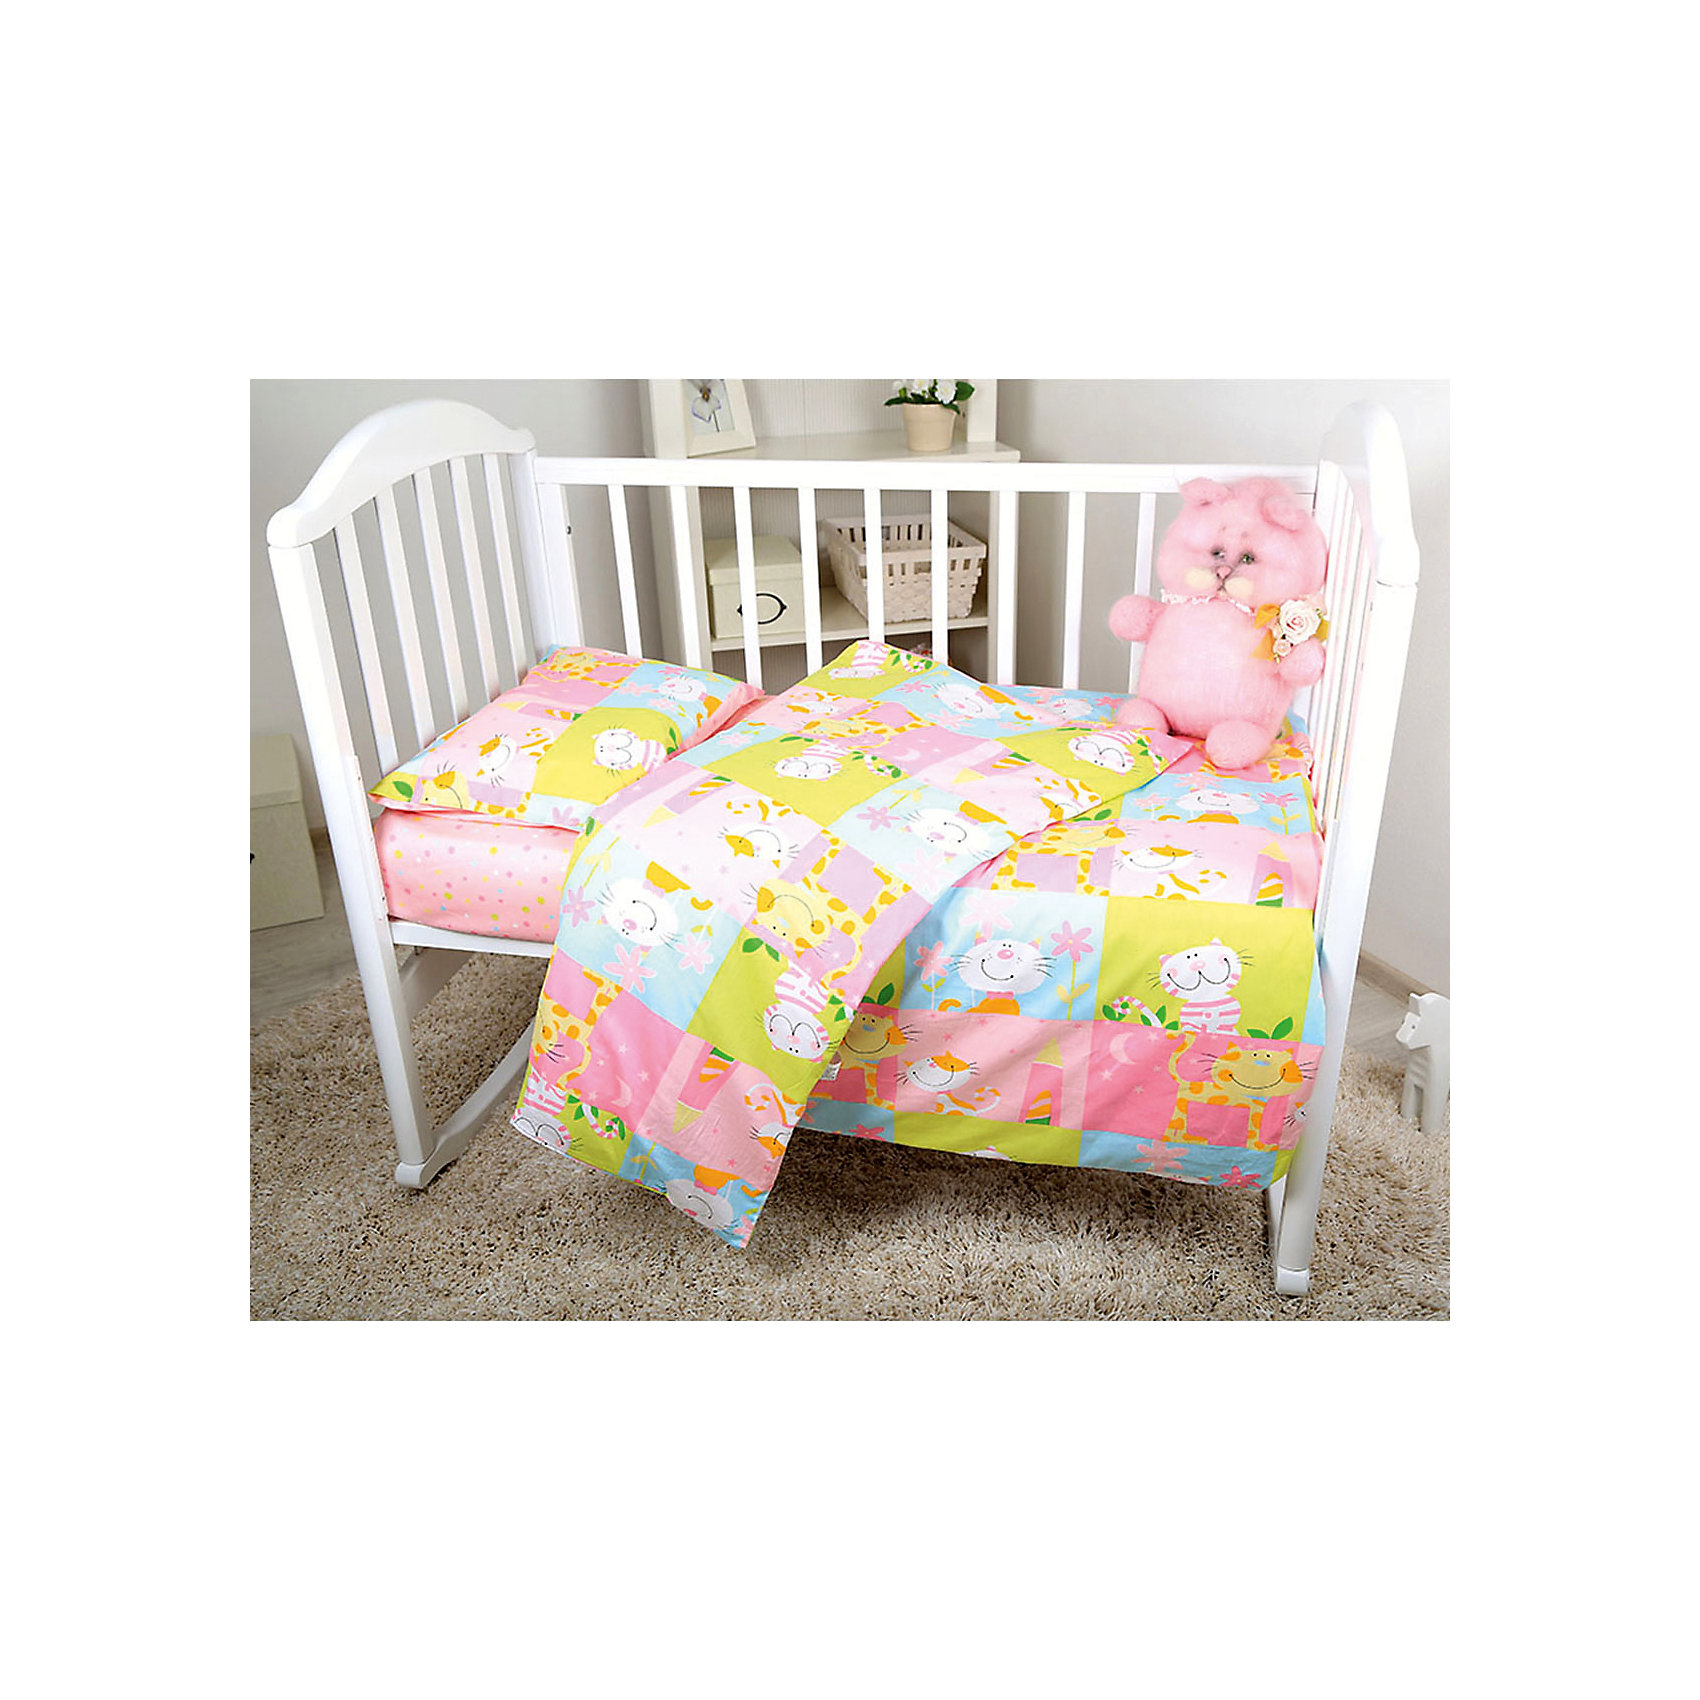 Baby Nice Постельное белье Мишки 3 пред., бязь 60х120, Baby Nice, розовый baby nice бортик мишки бязь baby nice розовый